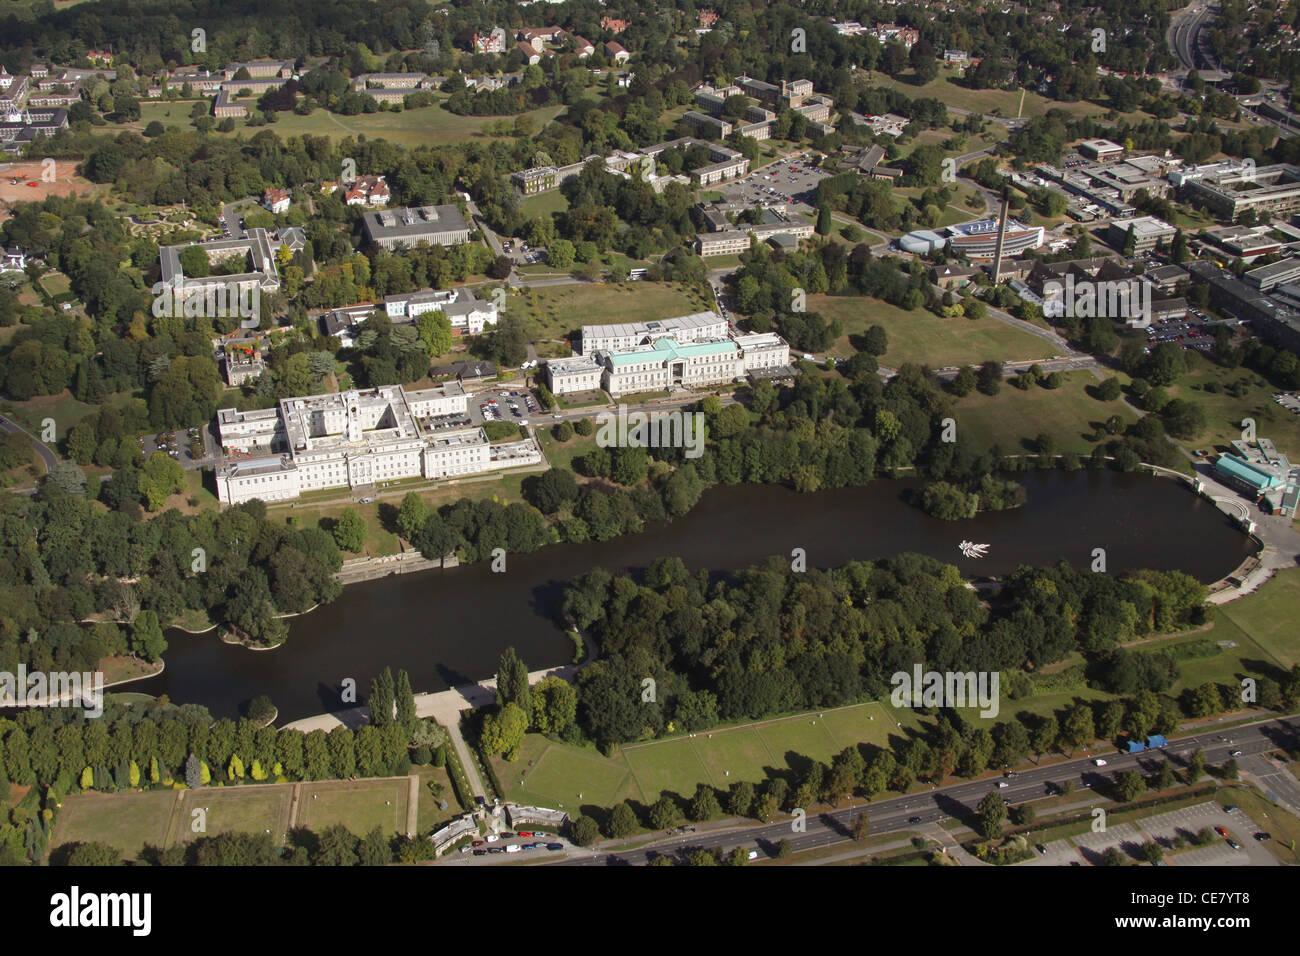 Aerial Photograph of Nottingham University - Stock Image